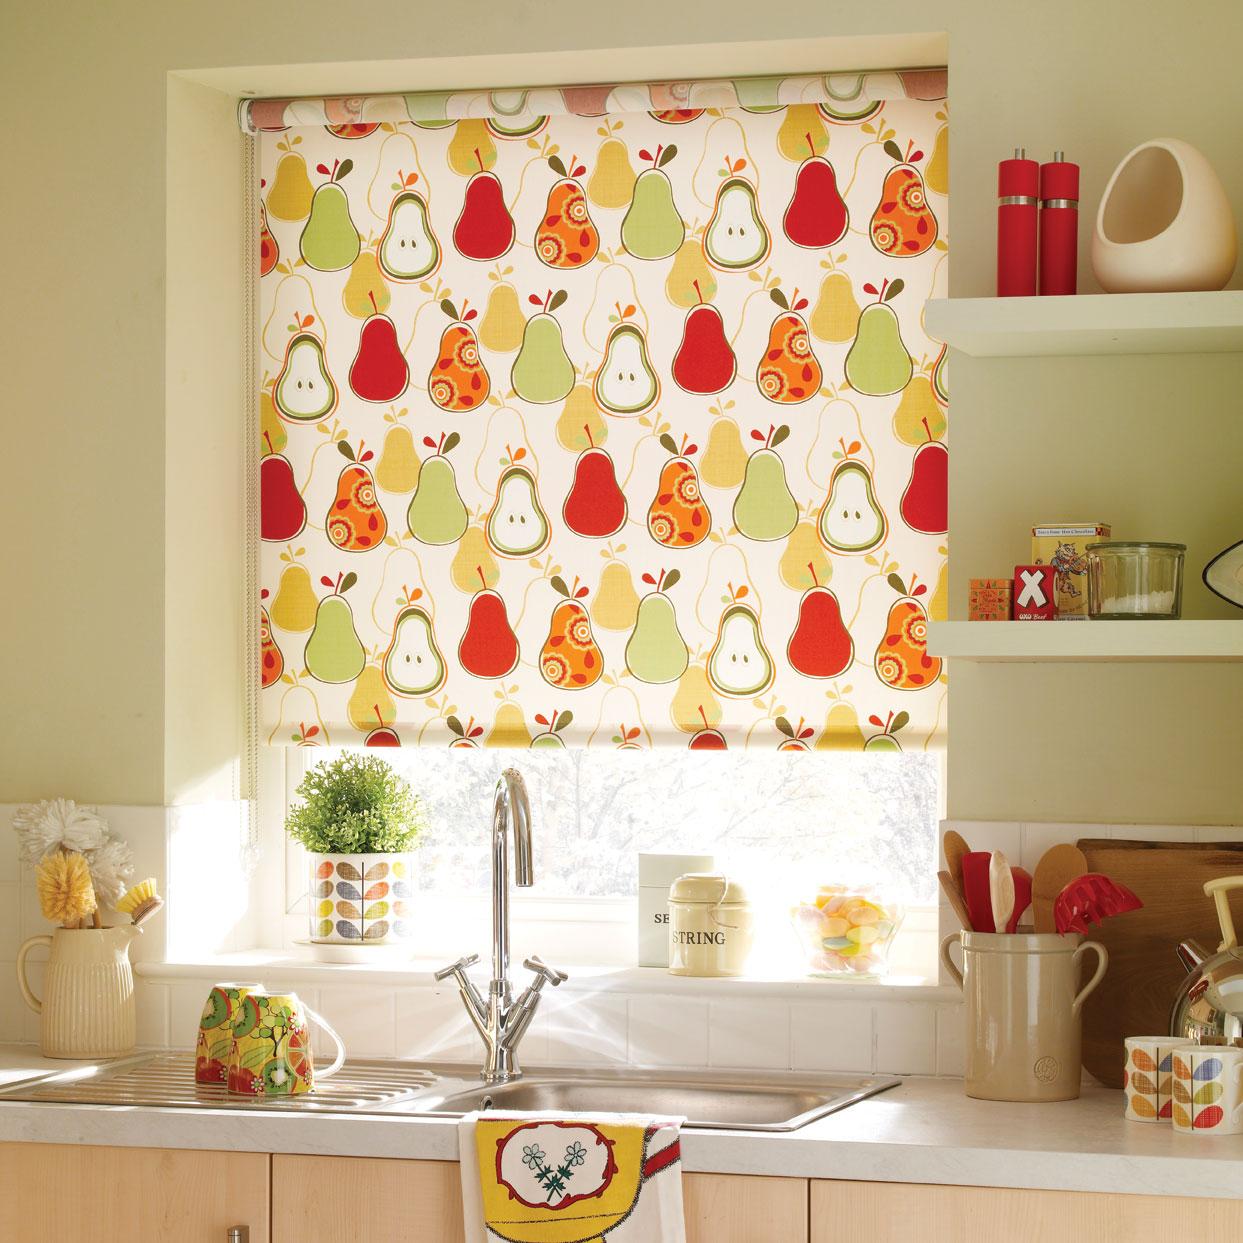 Рулонные шторы на кухне с забавным принтом